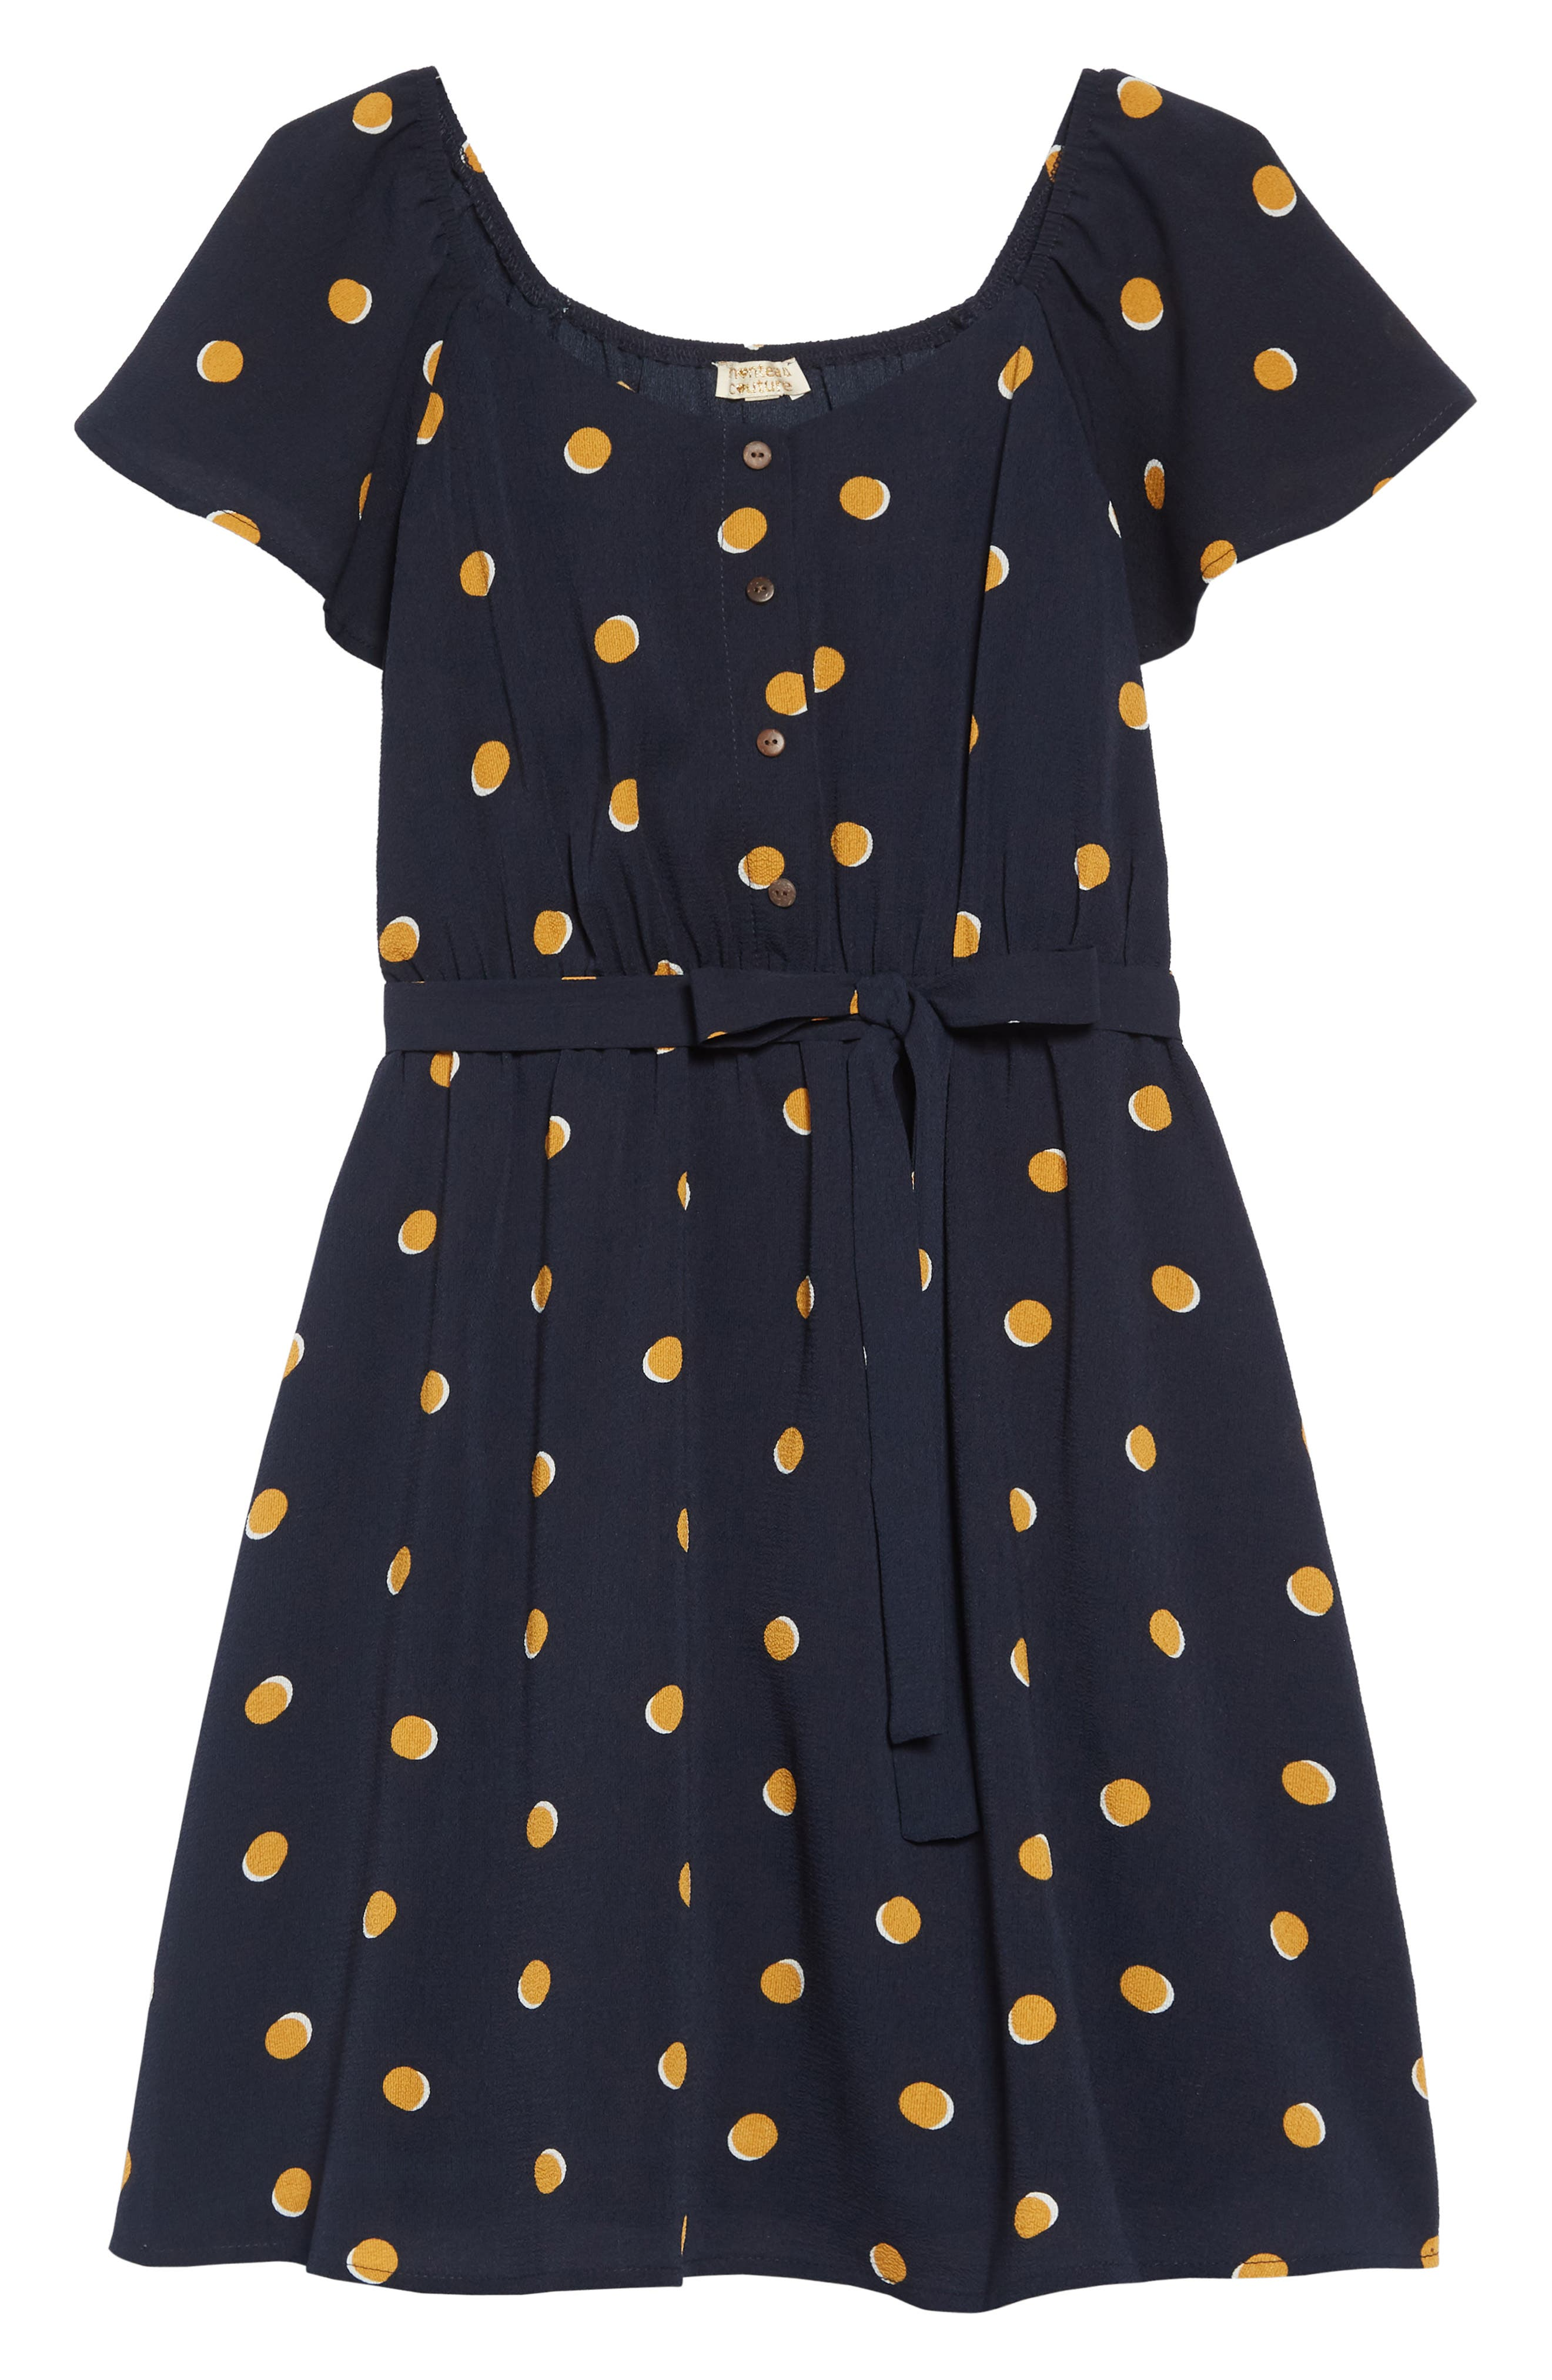 Polka Dot Flutter Sleeve Dress, Main, color, NAVY/MUSTARD